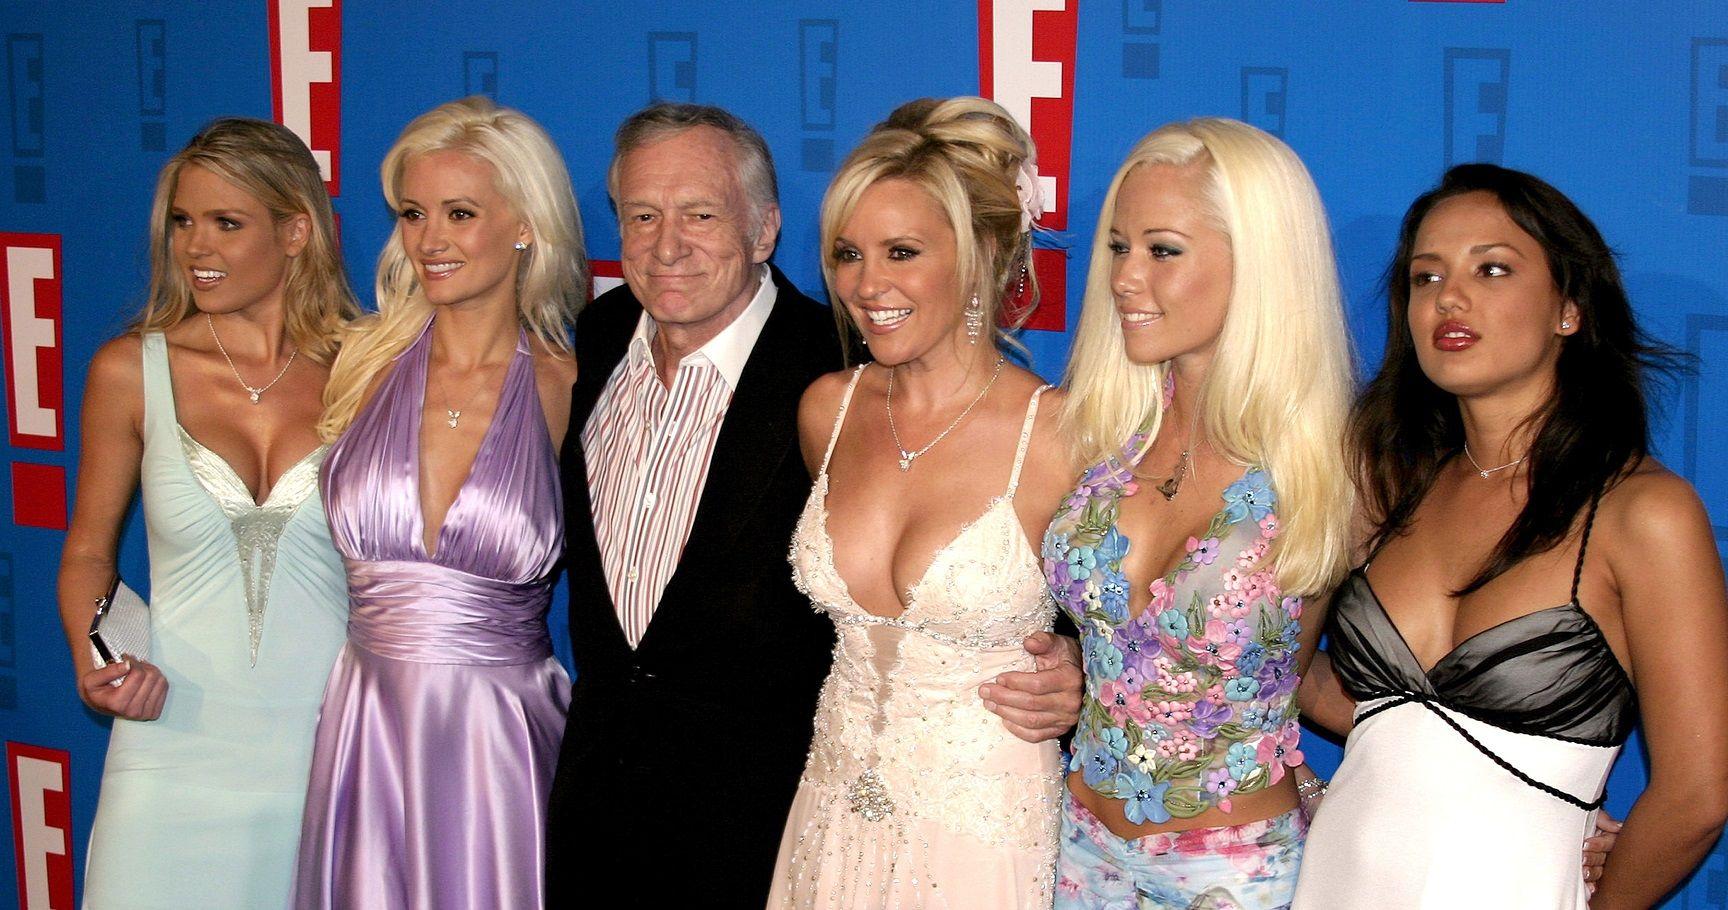 Playboy Will No Longer Include Nude Women